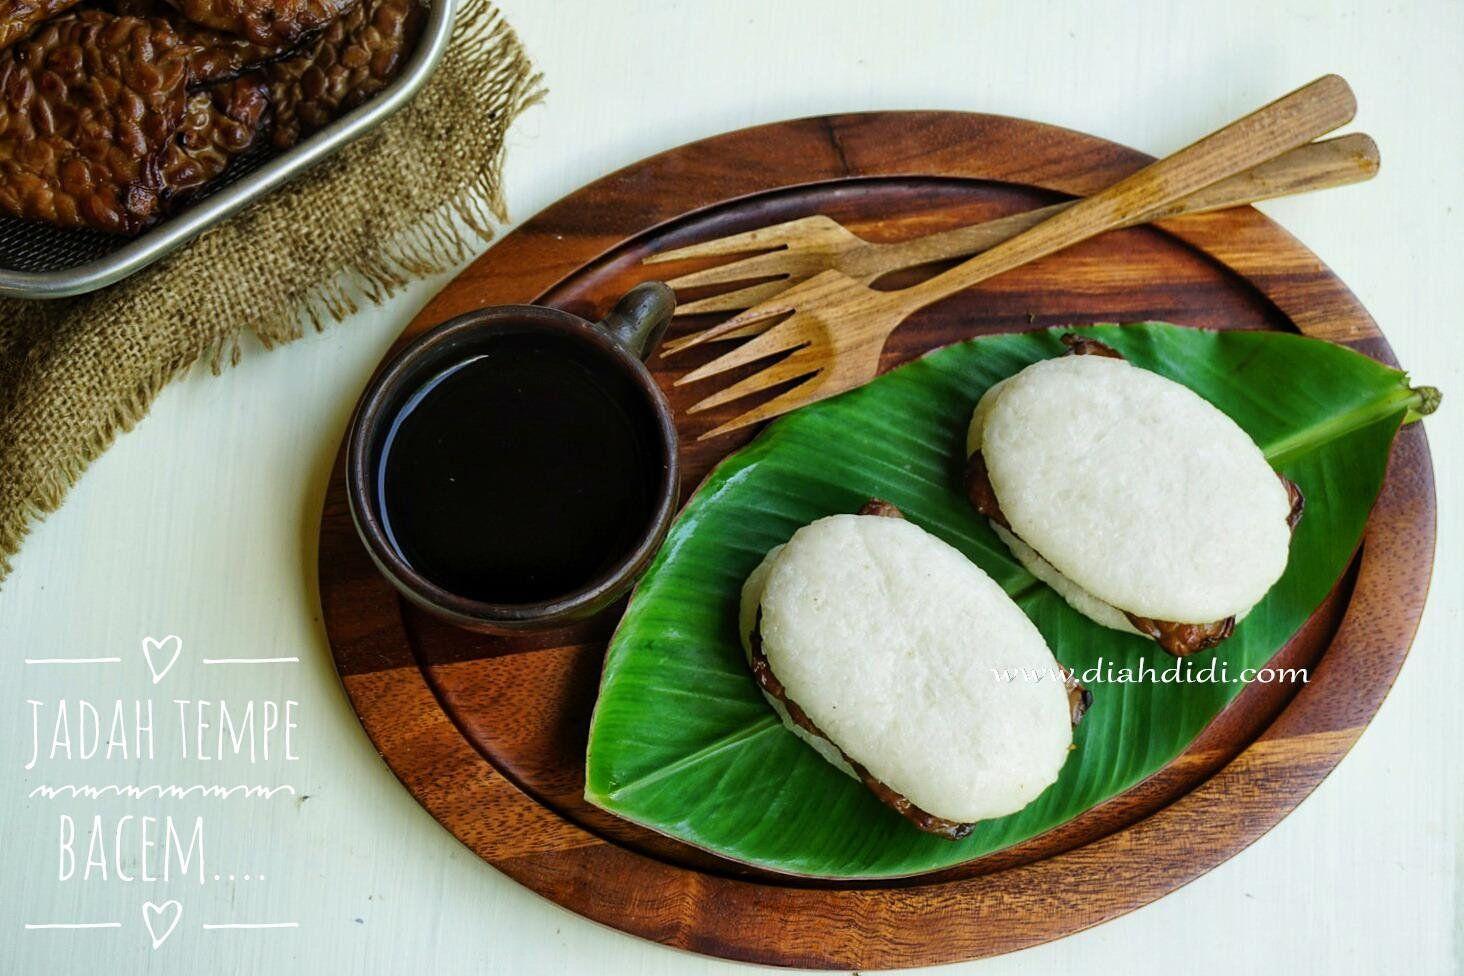 Jadah Ala Kaliurang Yogya By Diah Didi S Kitchen Resep Resep Resep Masakan Masakan